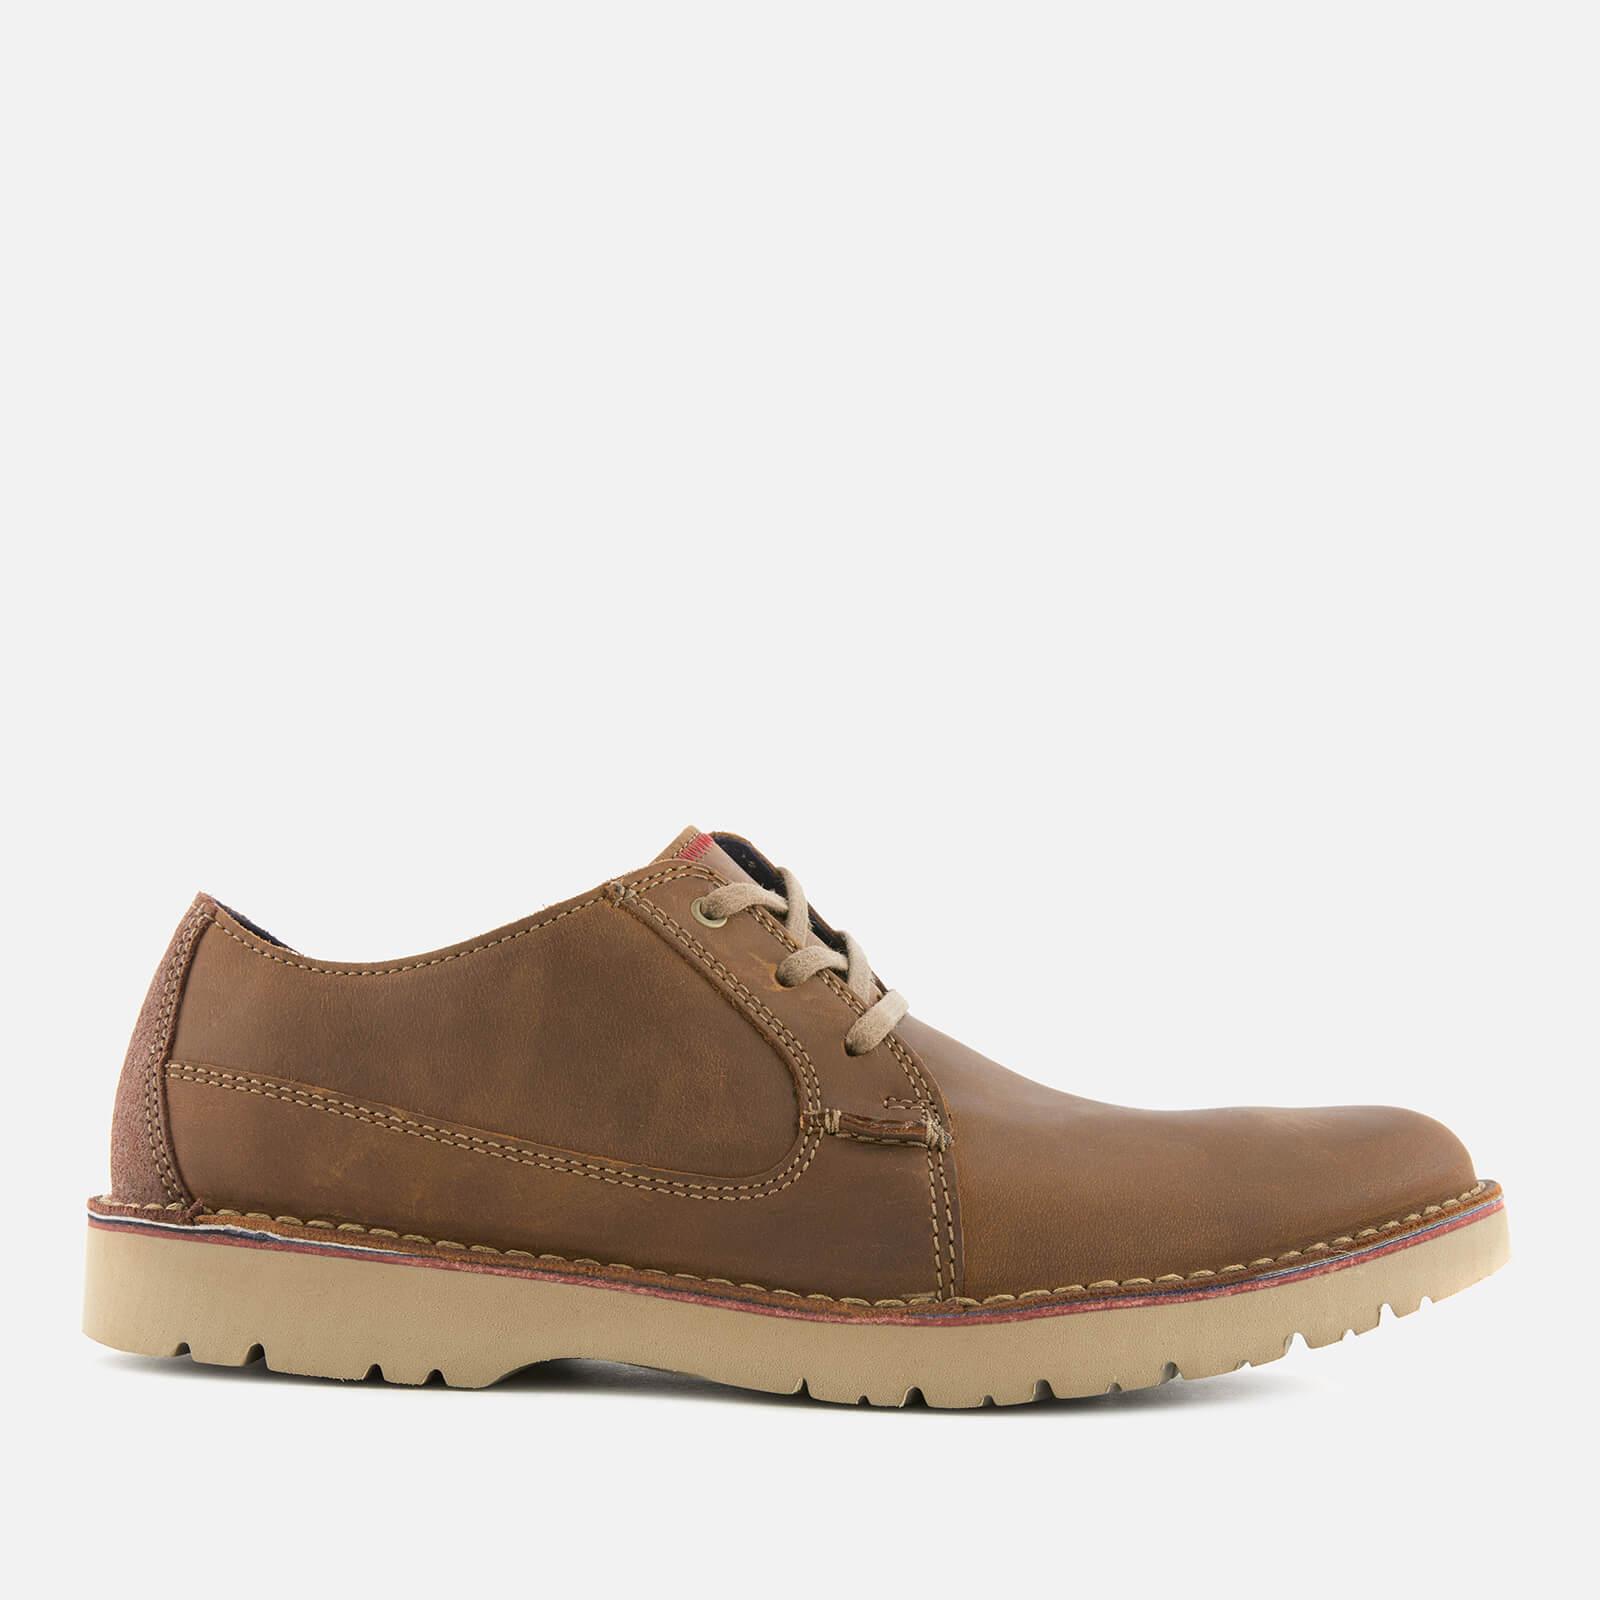 Clarks Men's Vargo Plain Leather Derby Shoes - Dark Tan - UK 9